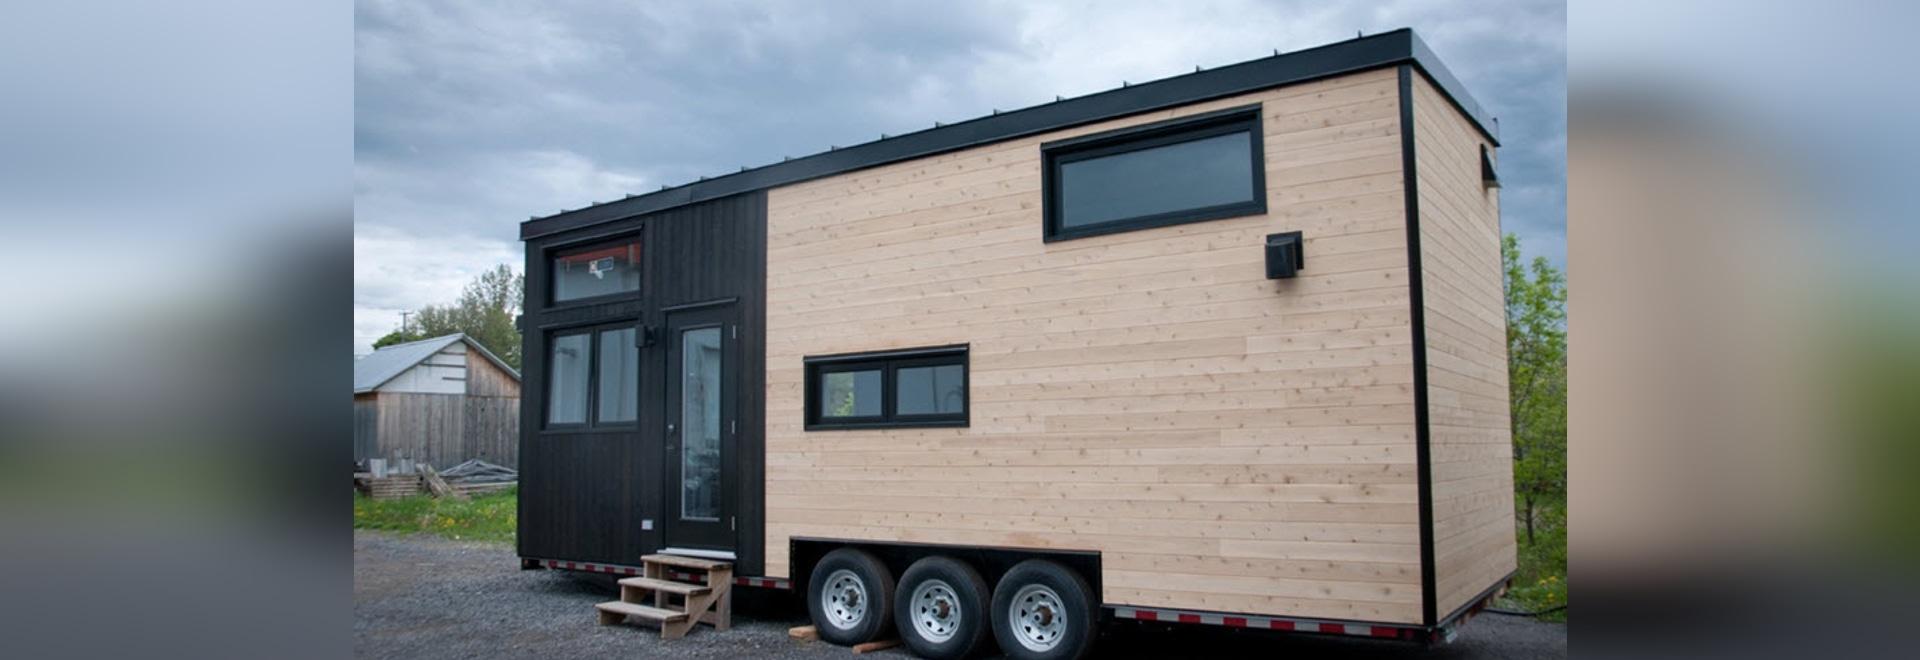 Minimaliste Builds a Tiny House Surf Shack Called Noyer